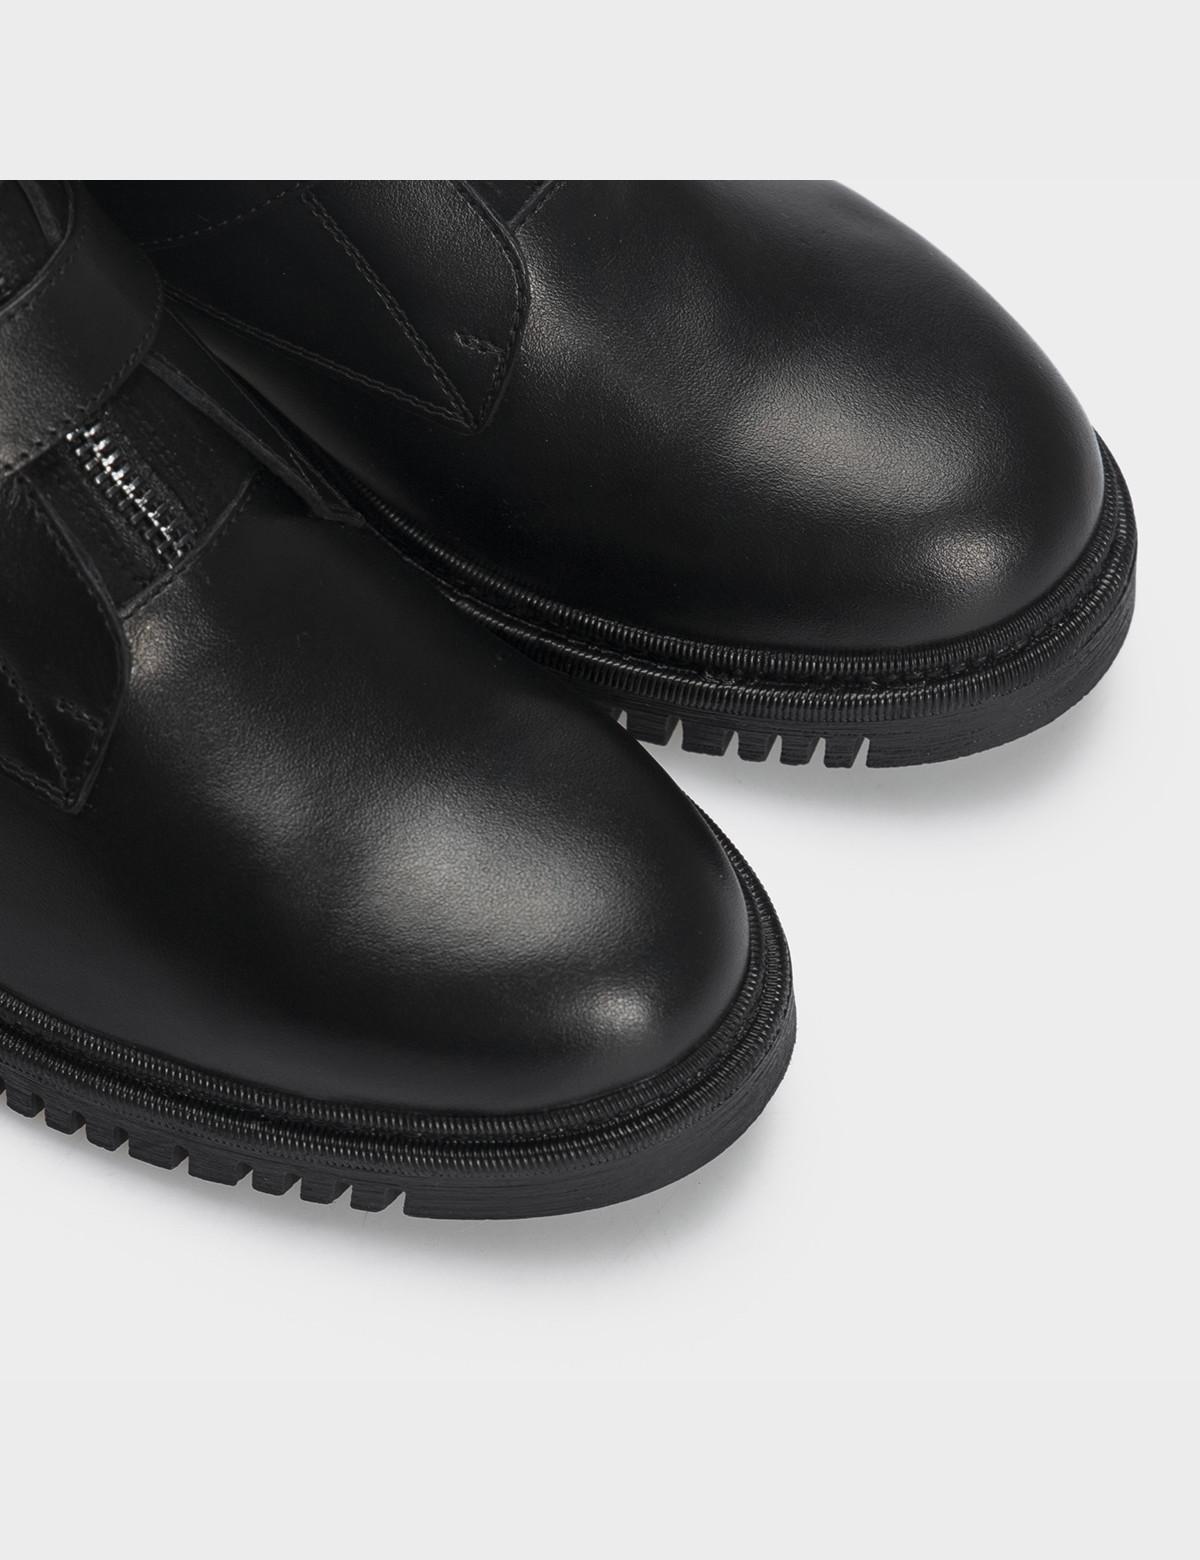 Ботинки, натуральная кожа/замша. Байка4